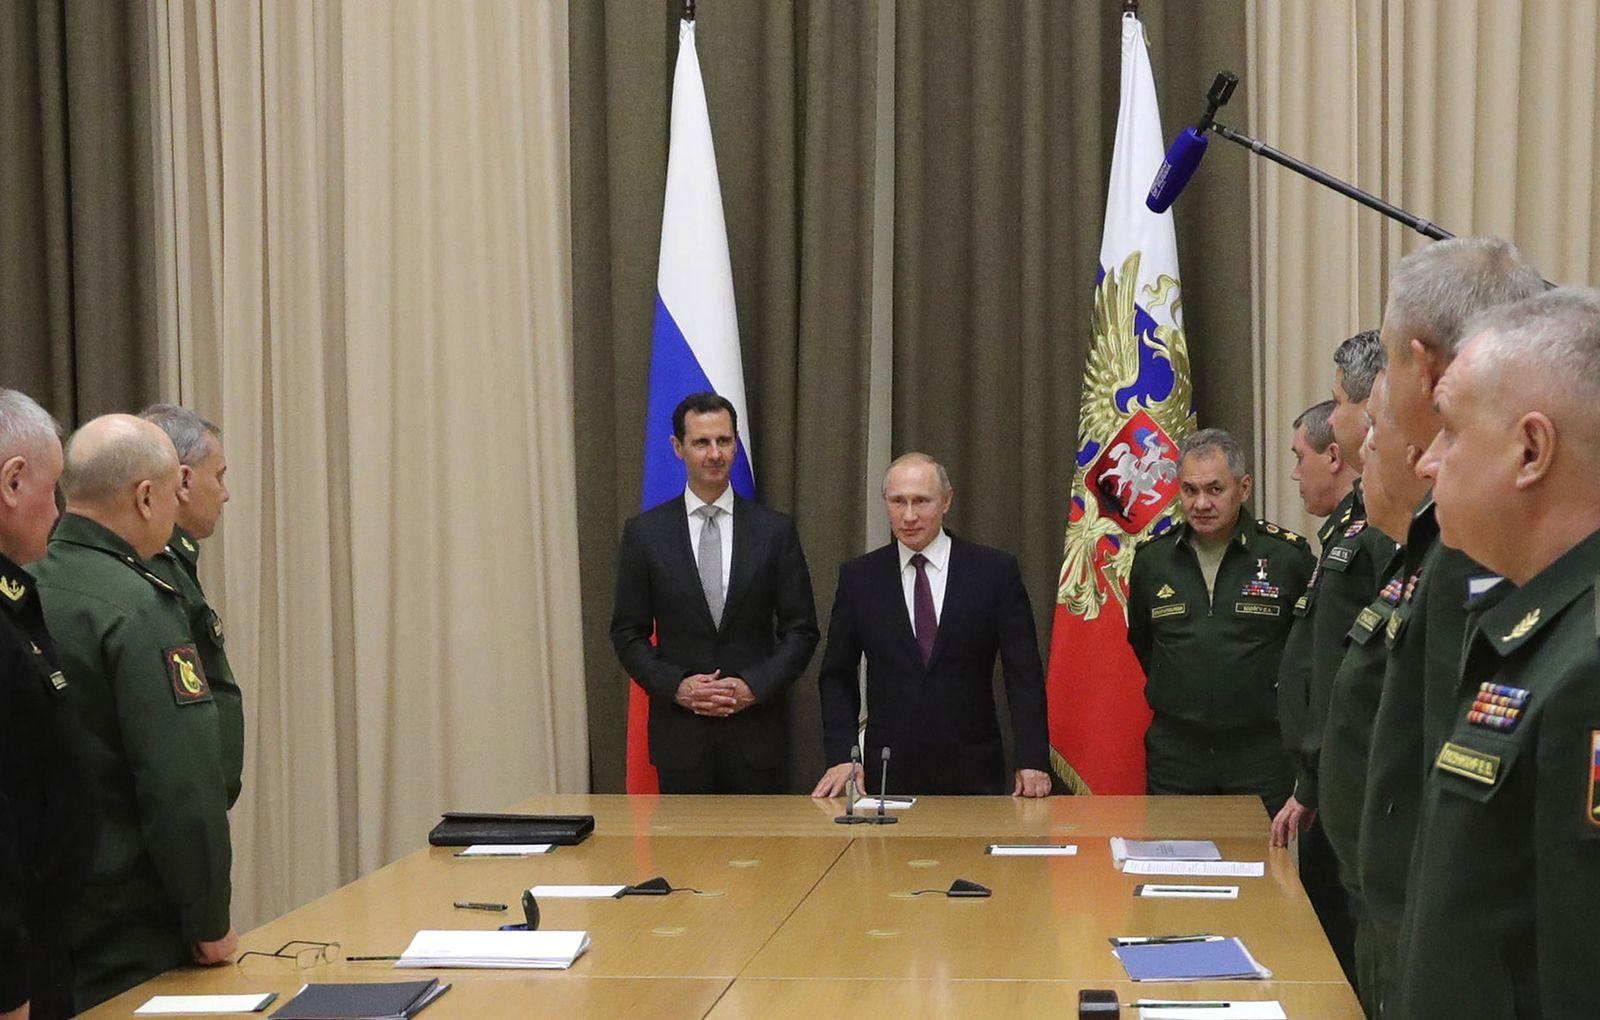 Wladimir Putin/Baschar al-Assad